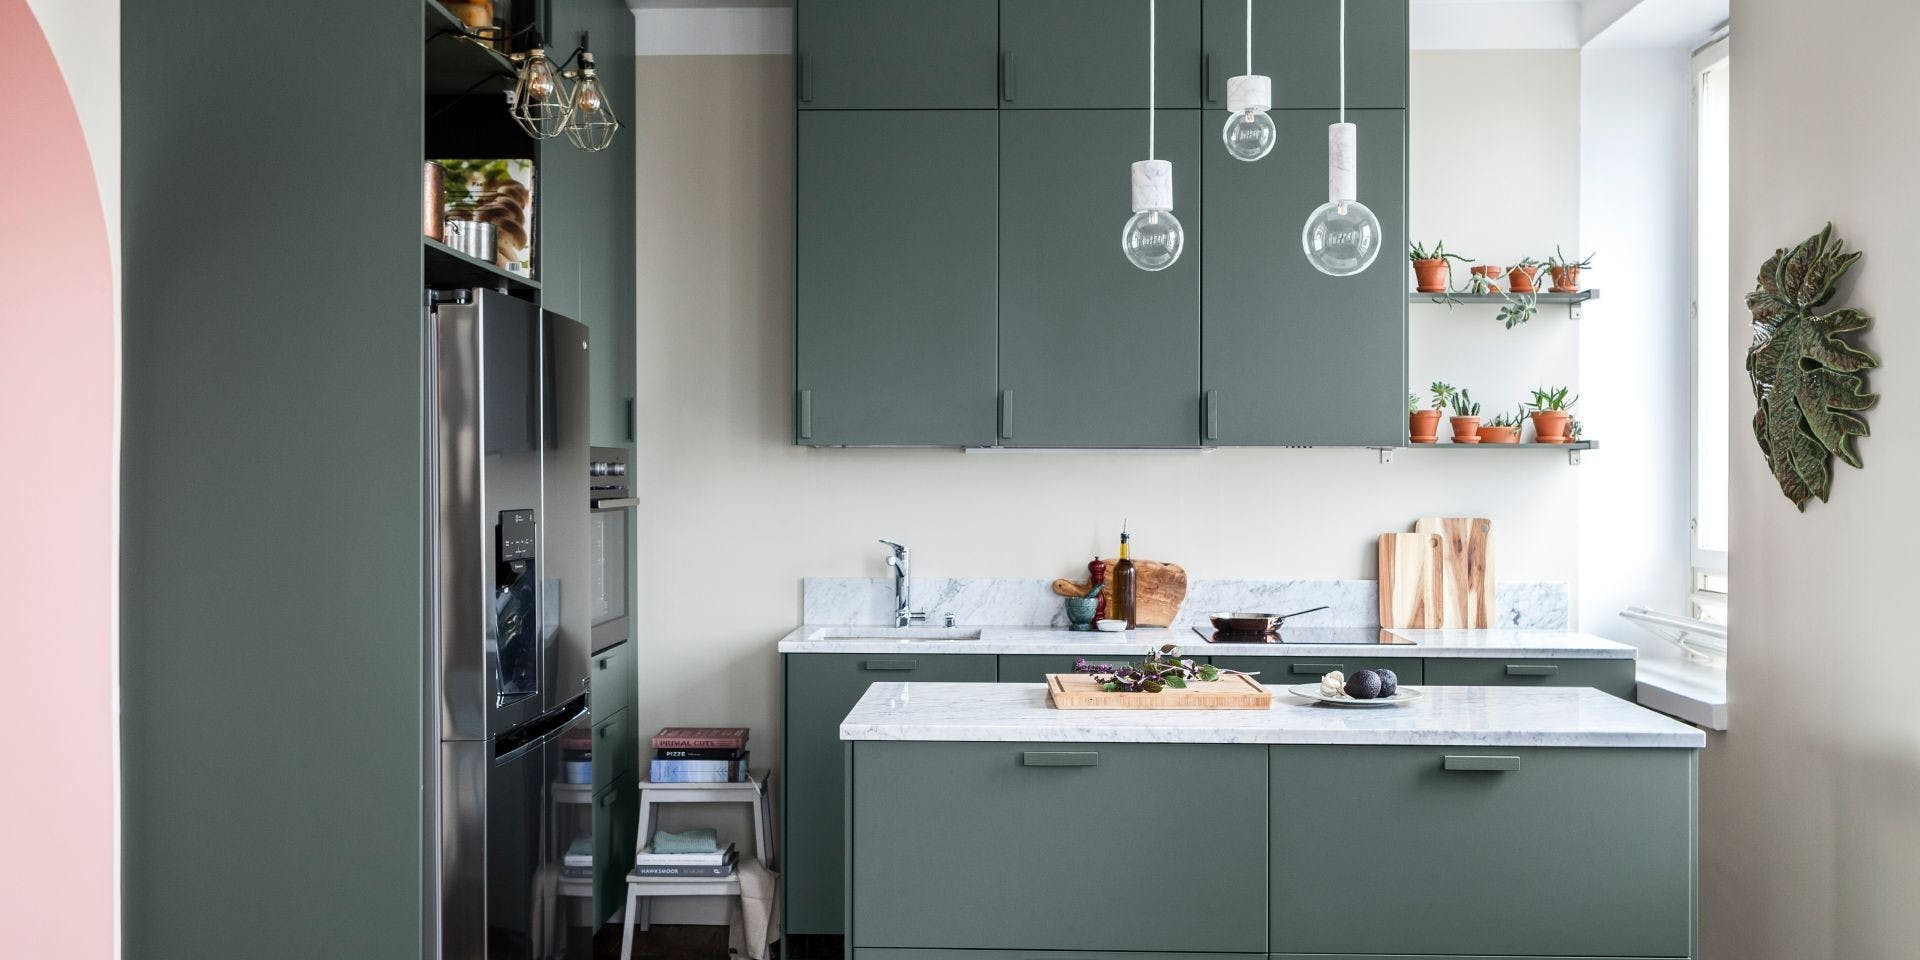 DIY Painted Kitchen Cupboard Refresh - Tikkurila Abyss - Thumbnail image